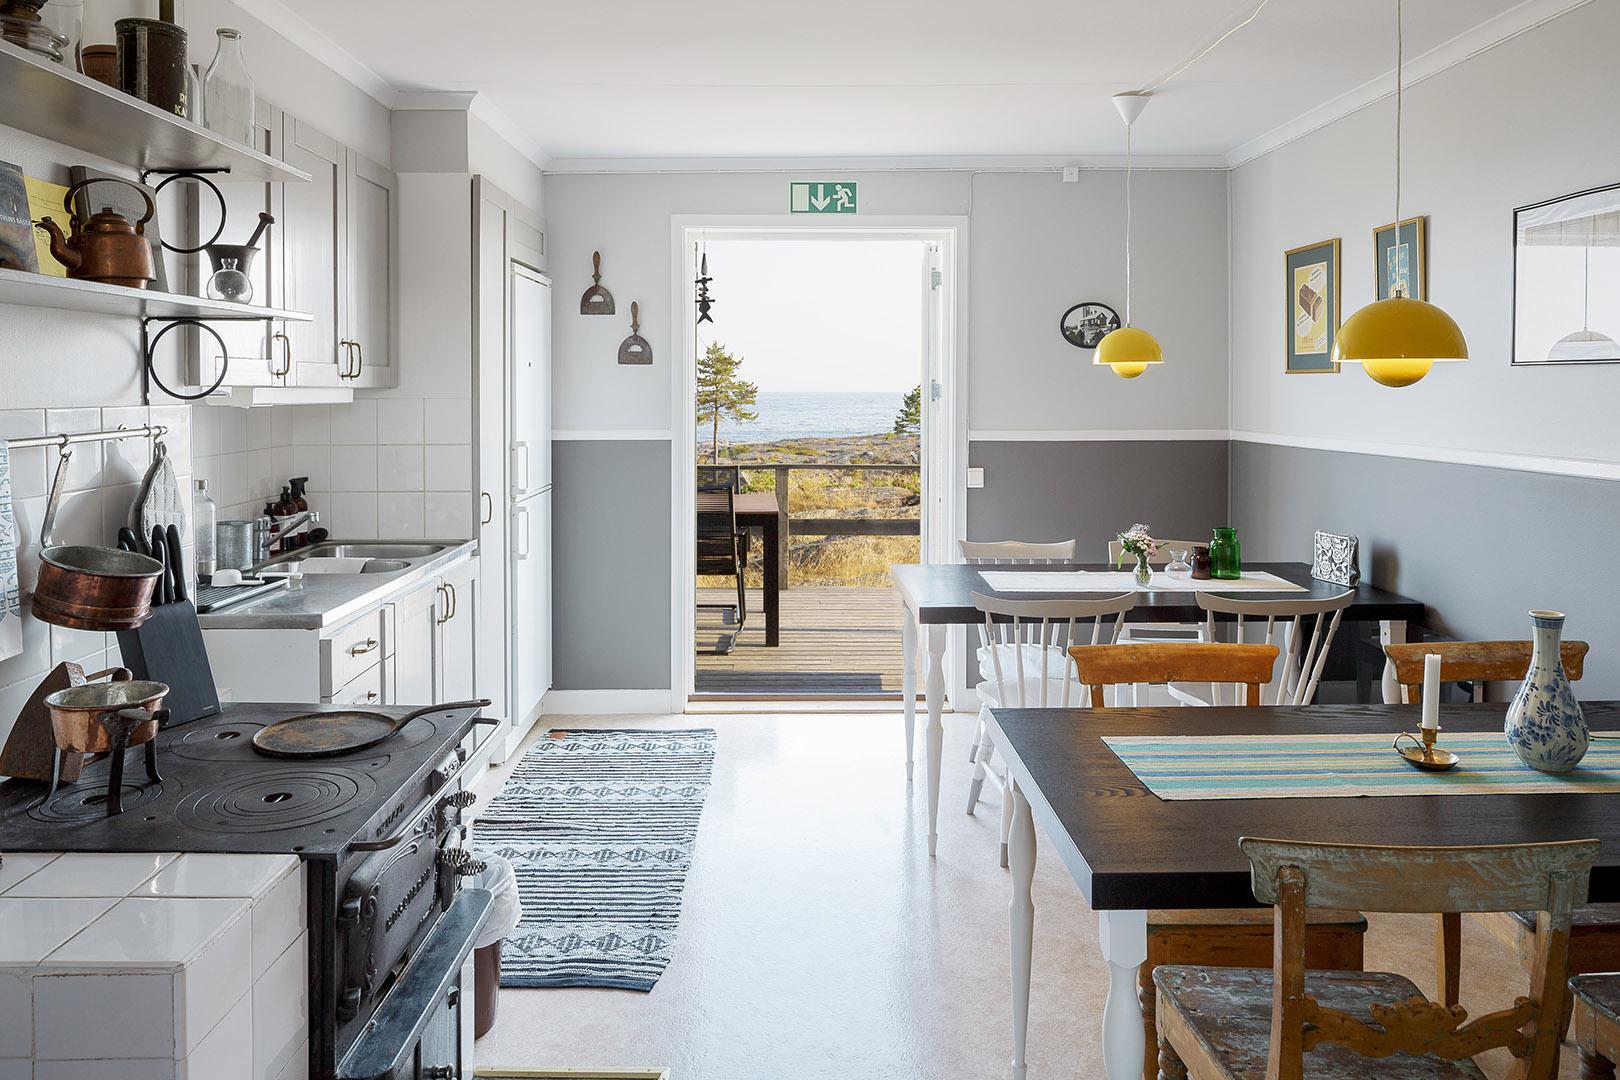 2_Lotshuset_06_kitchen_Andreas Nilsson